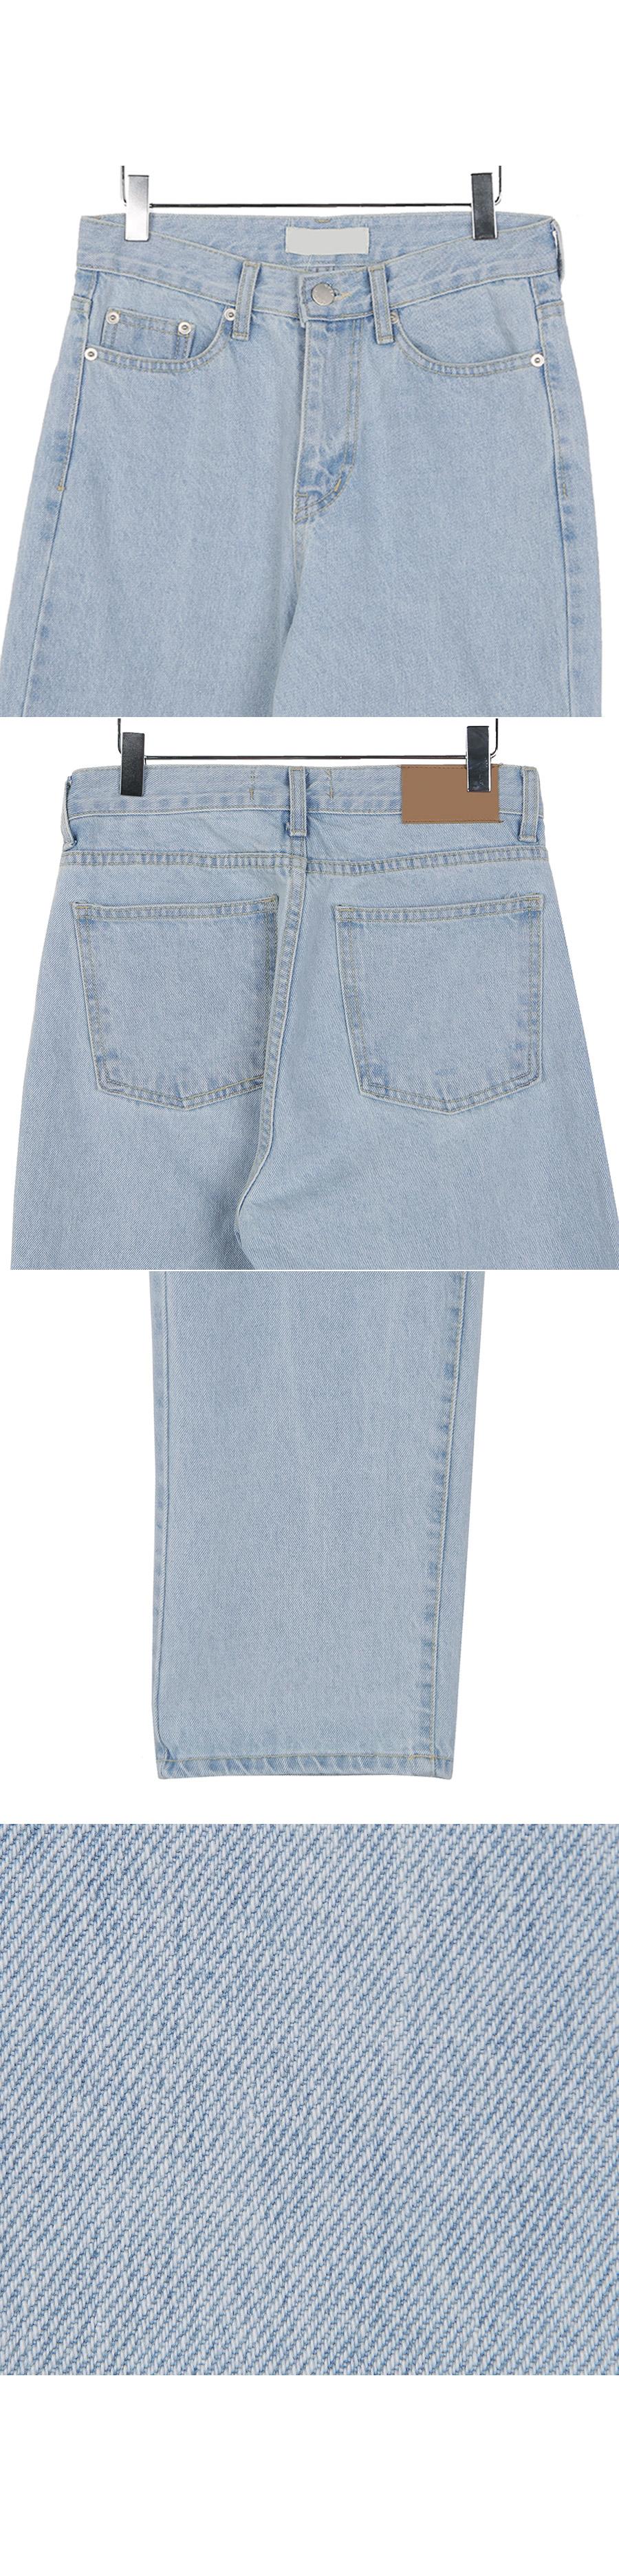 High long denim pants